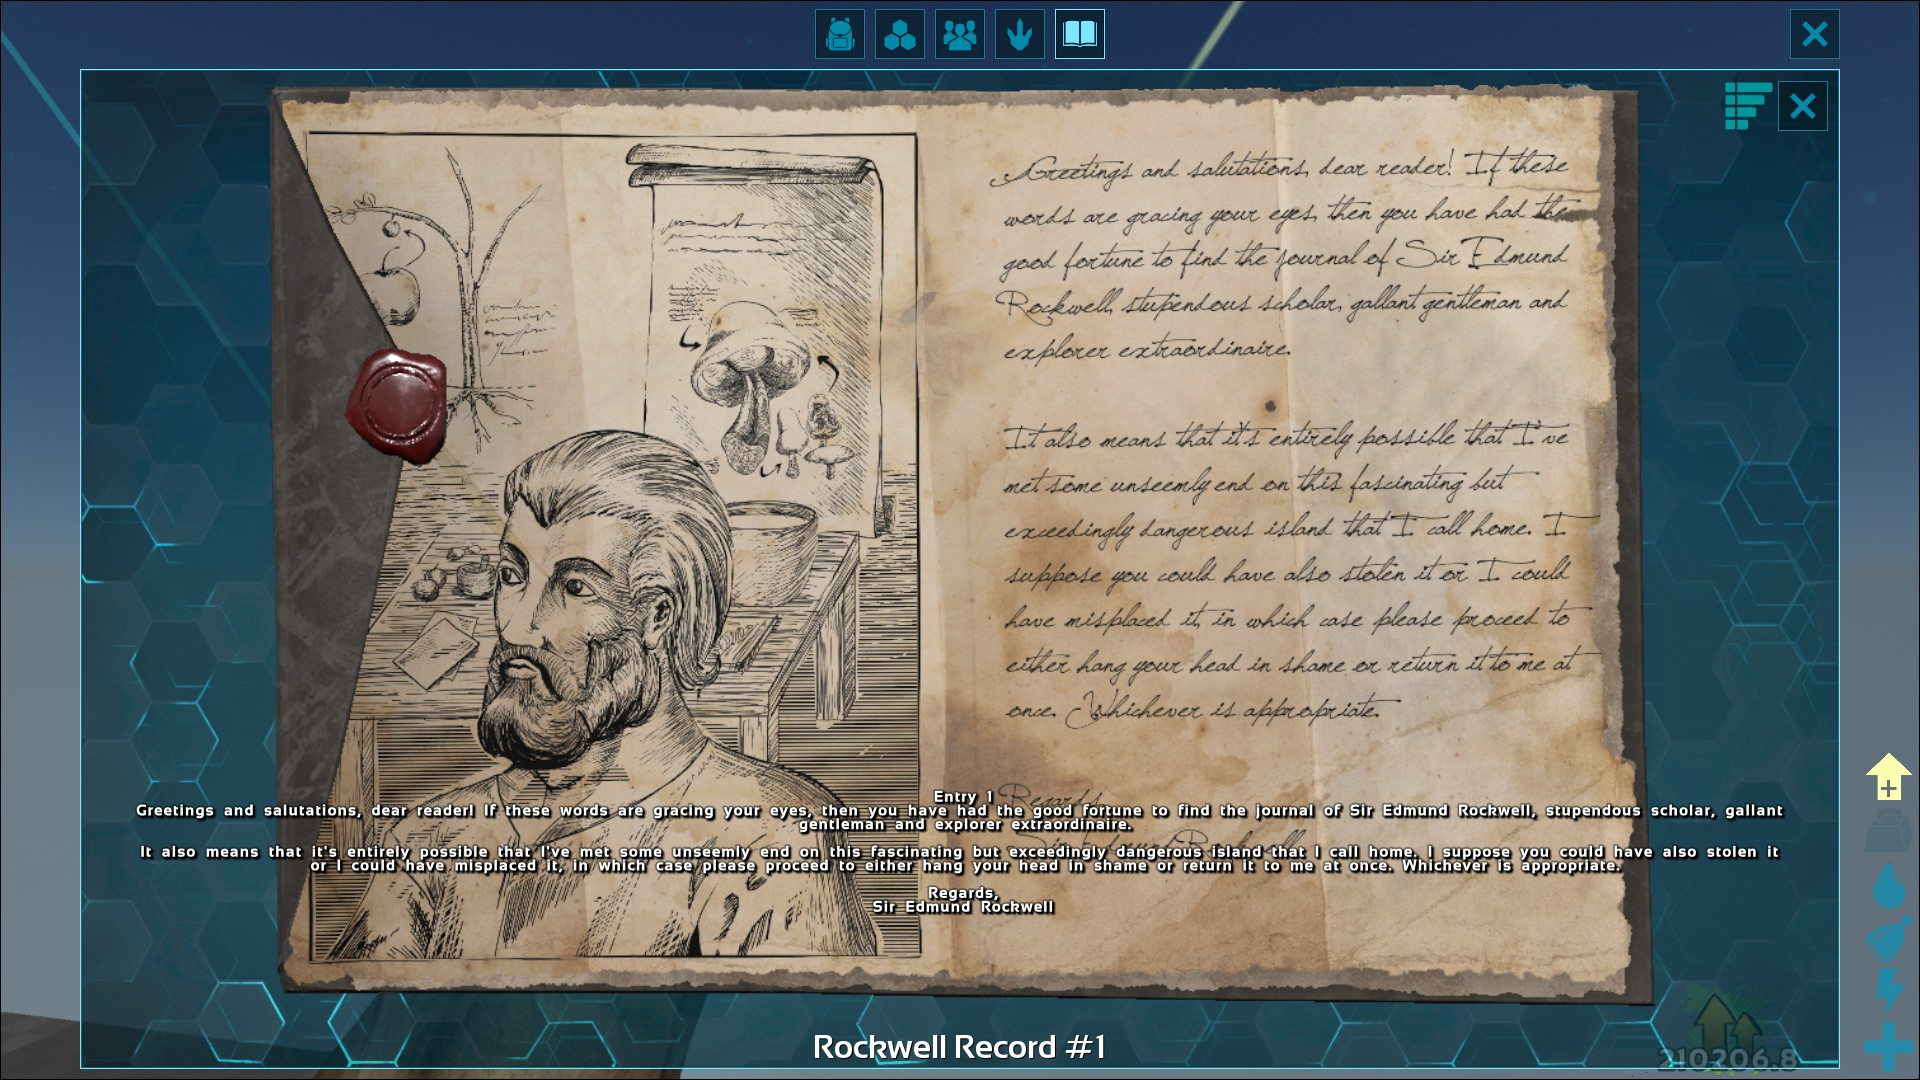 Rockwell Explorer Note